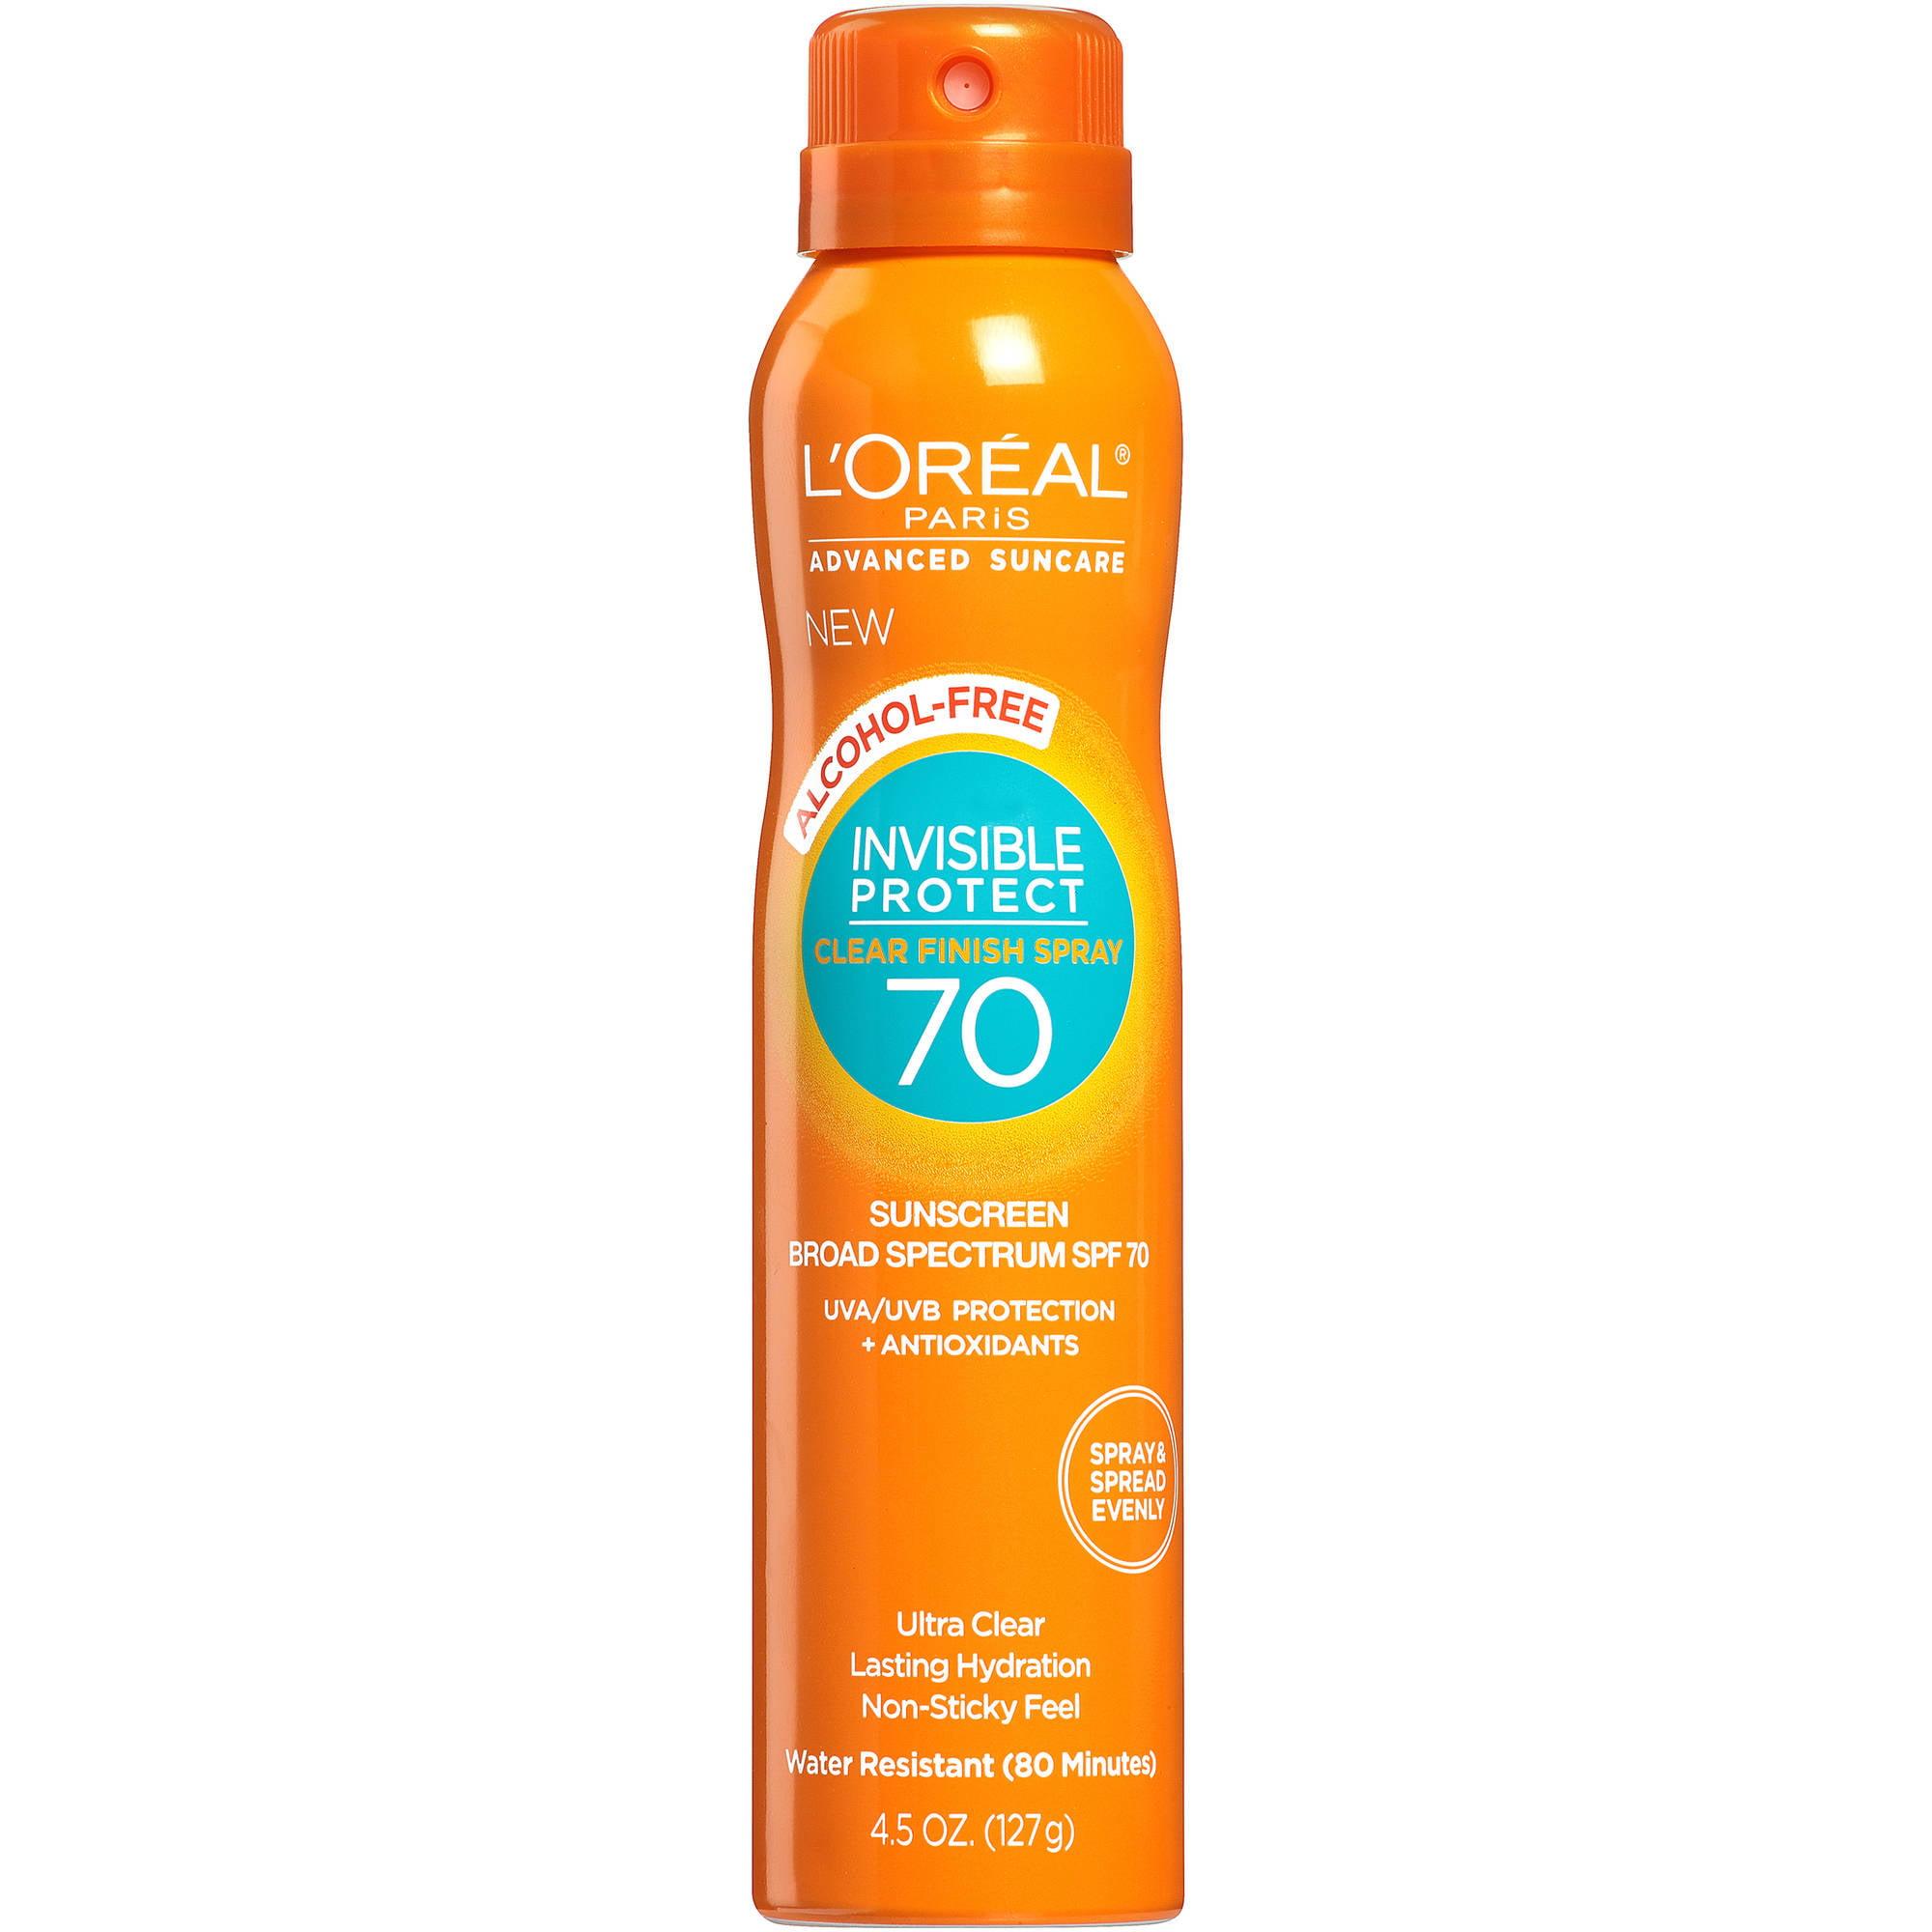 L'Oreal Paris Advanced Suncare Invisible Protect Clear Finish Spray Sunscreen, SPF 70, 4.5 oz